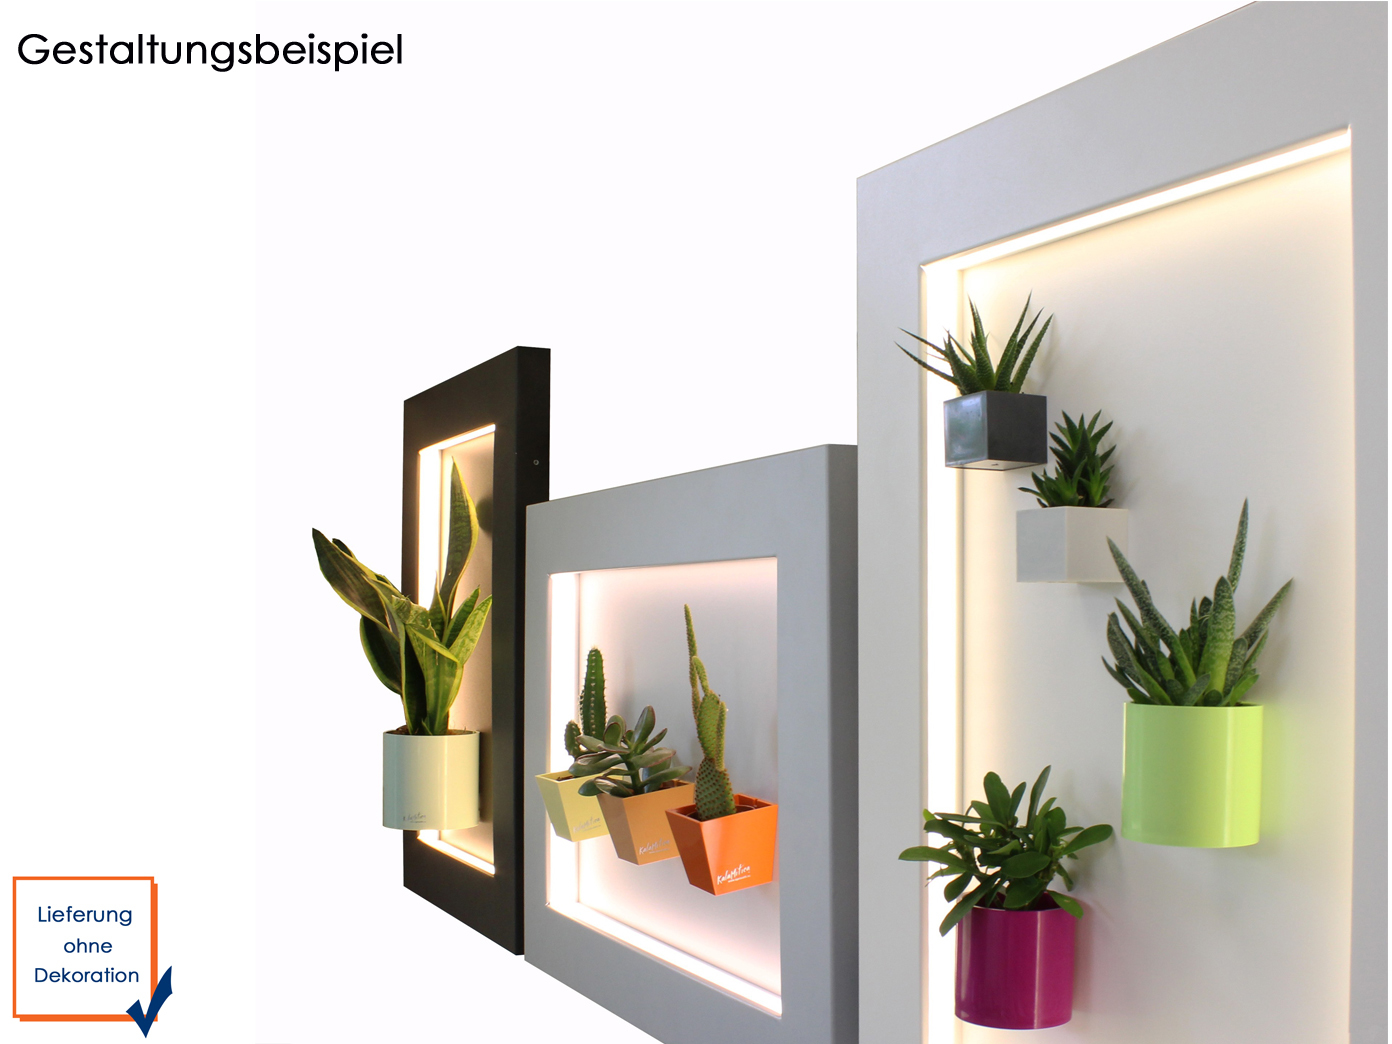 wanddeko magnettafel aus metall mit led beleuchtung 47 5 x. Black Bedroom Furniture Sets. Home Design Ideas